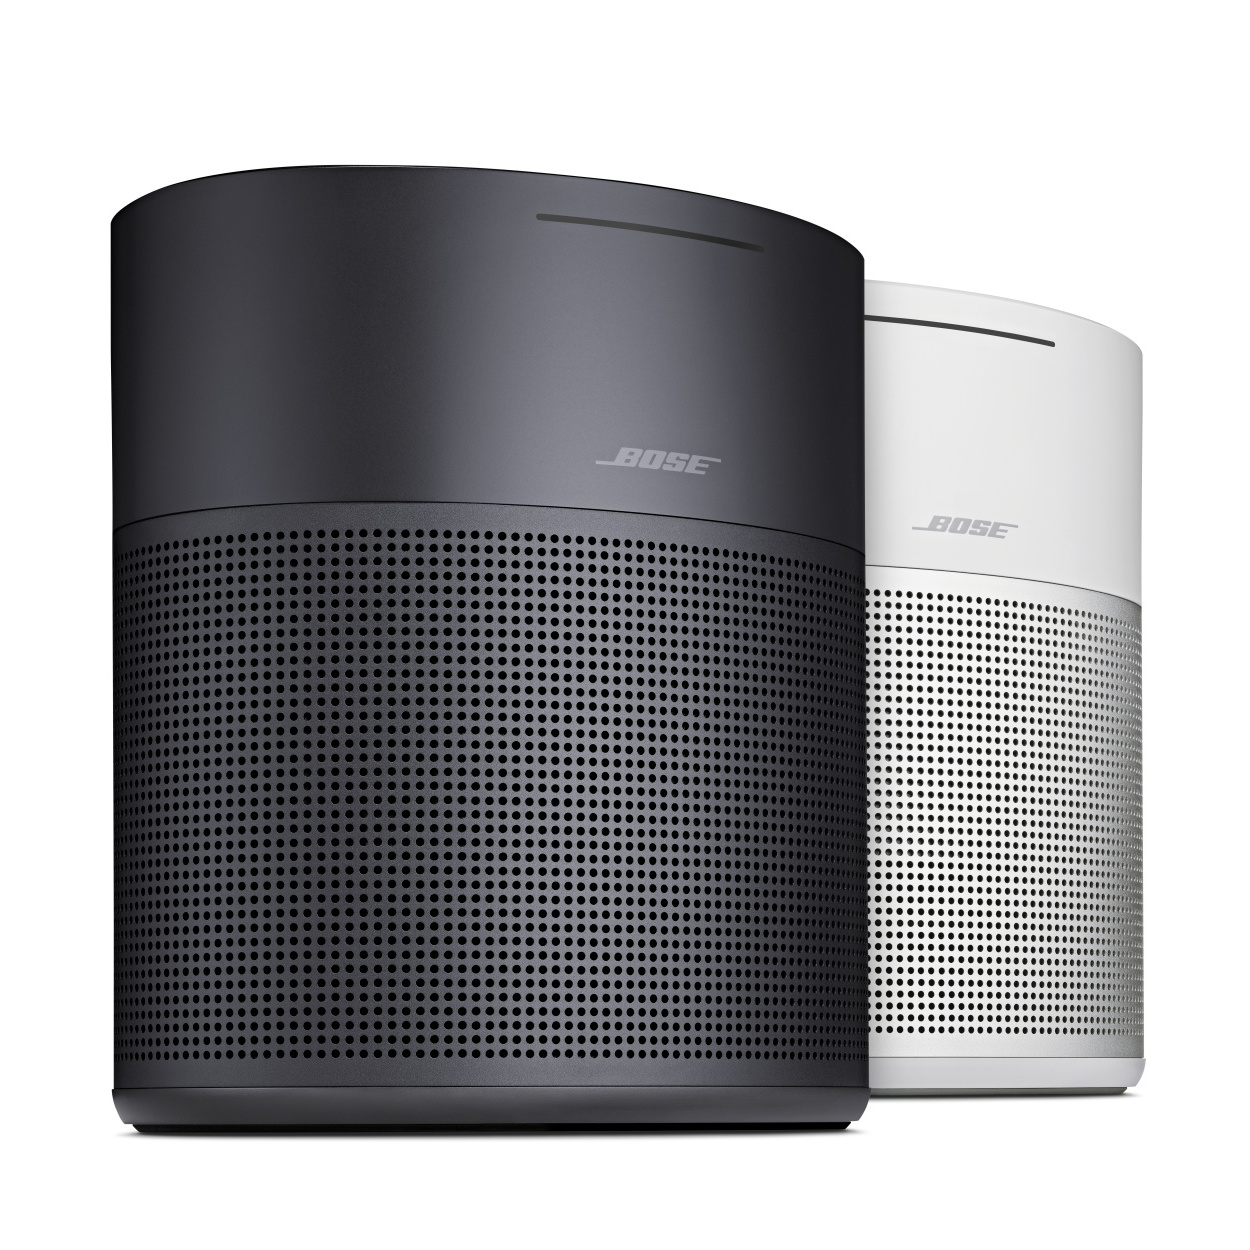 Google Assistant coming to Bose smart speakers, soundbars